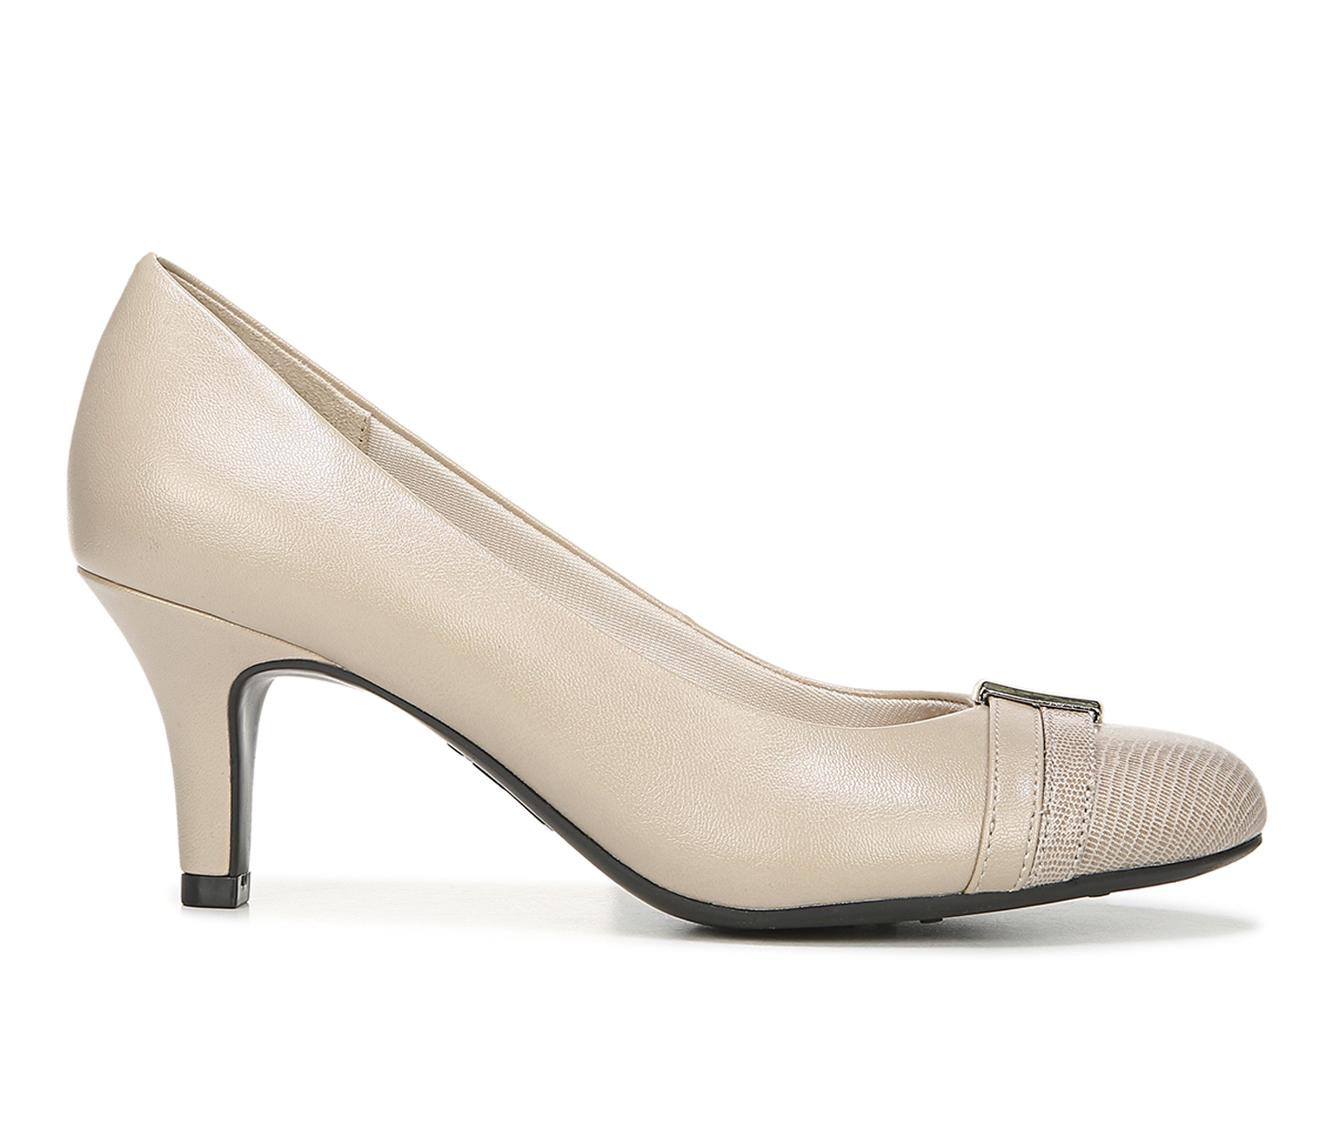 LifeStride Paisley Women's Dress Shoe (Beige Faux Leather)